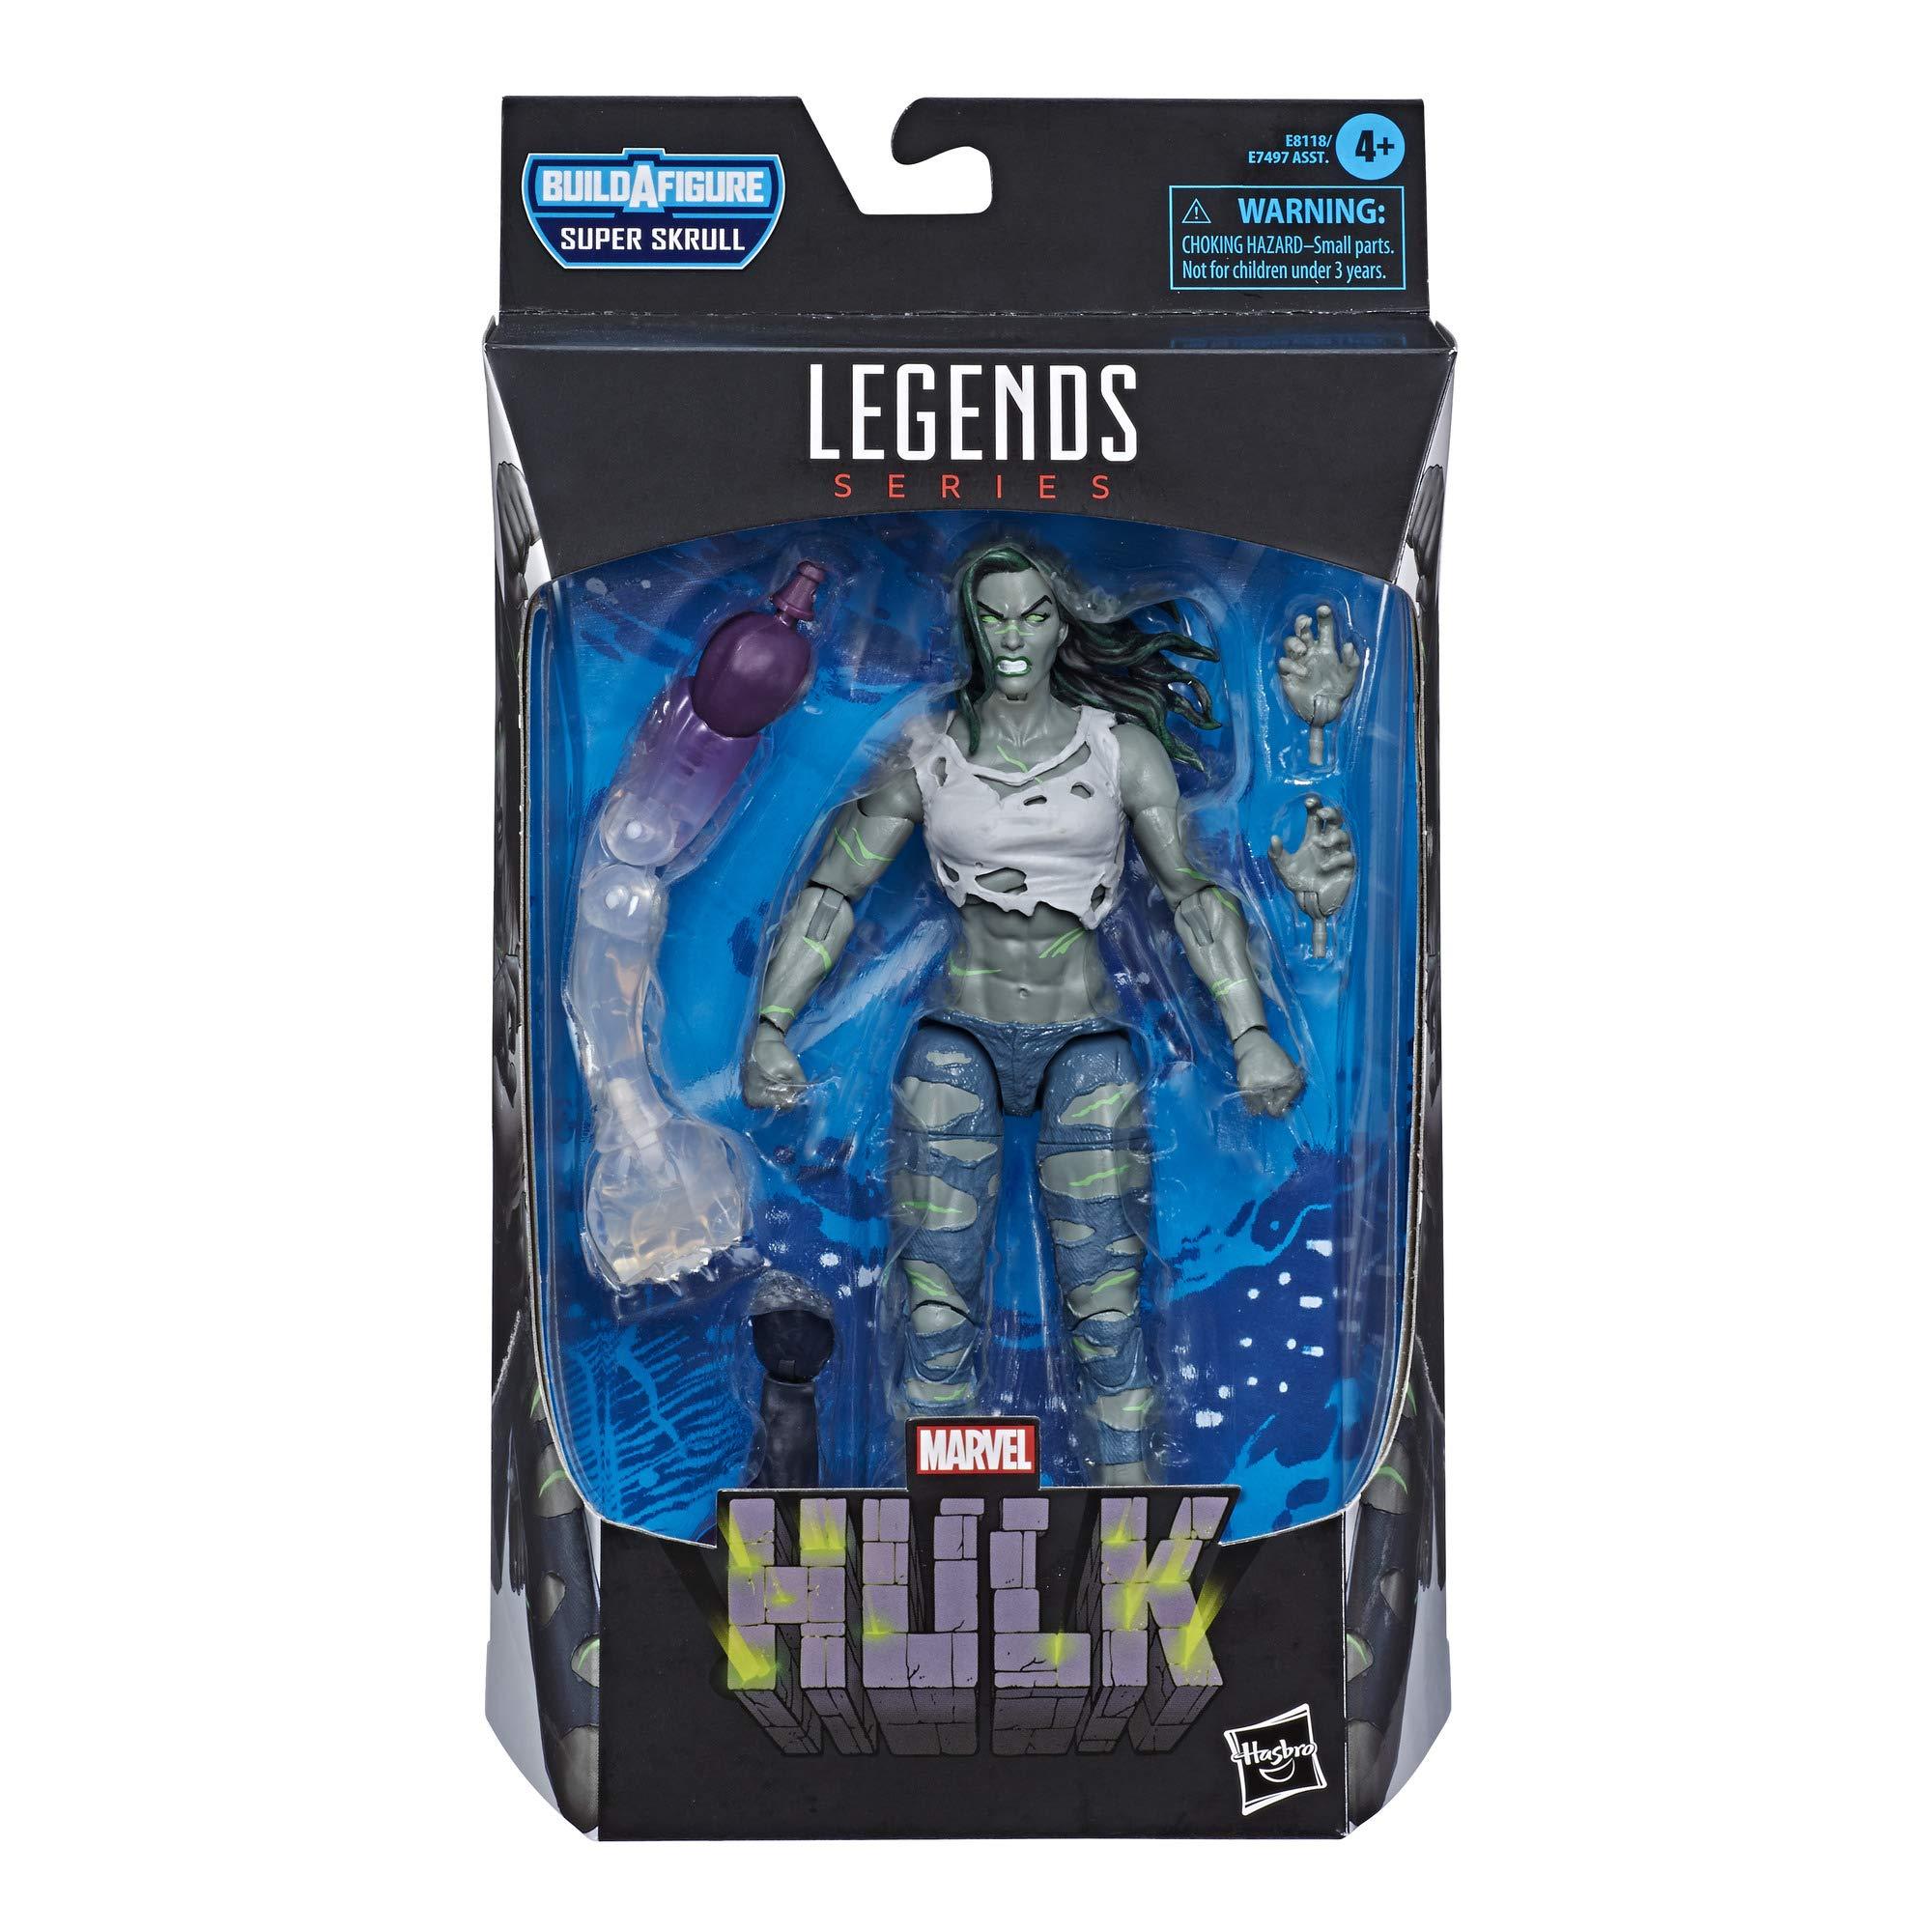 "Hasbro Marvel Legends Series 6"" Collectible Action Figure Hulk Toy, Premium Design & 2 Accessories, 2 Build-A-Figure Parts"